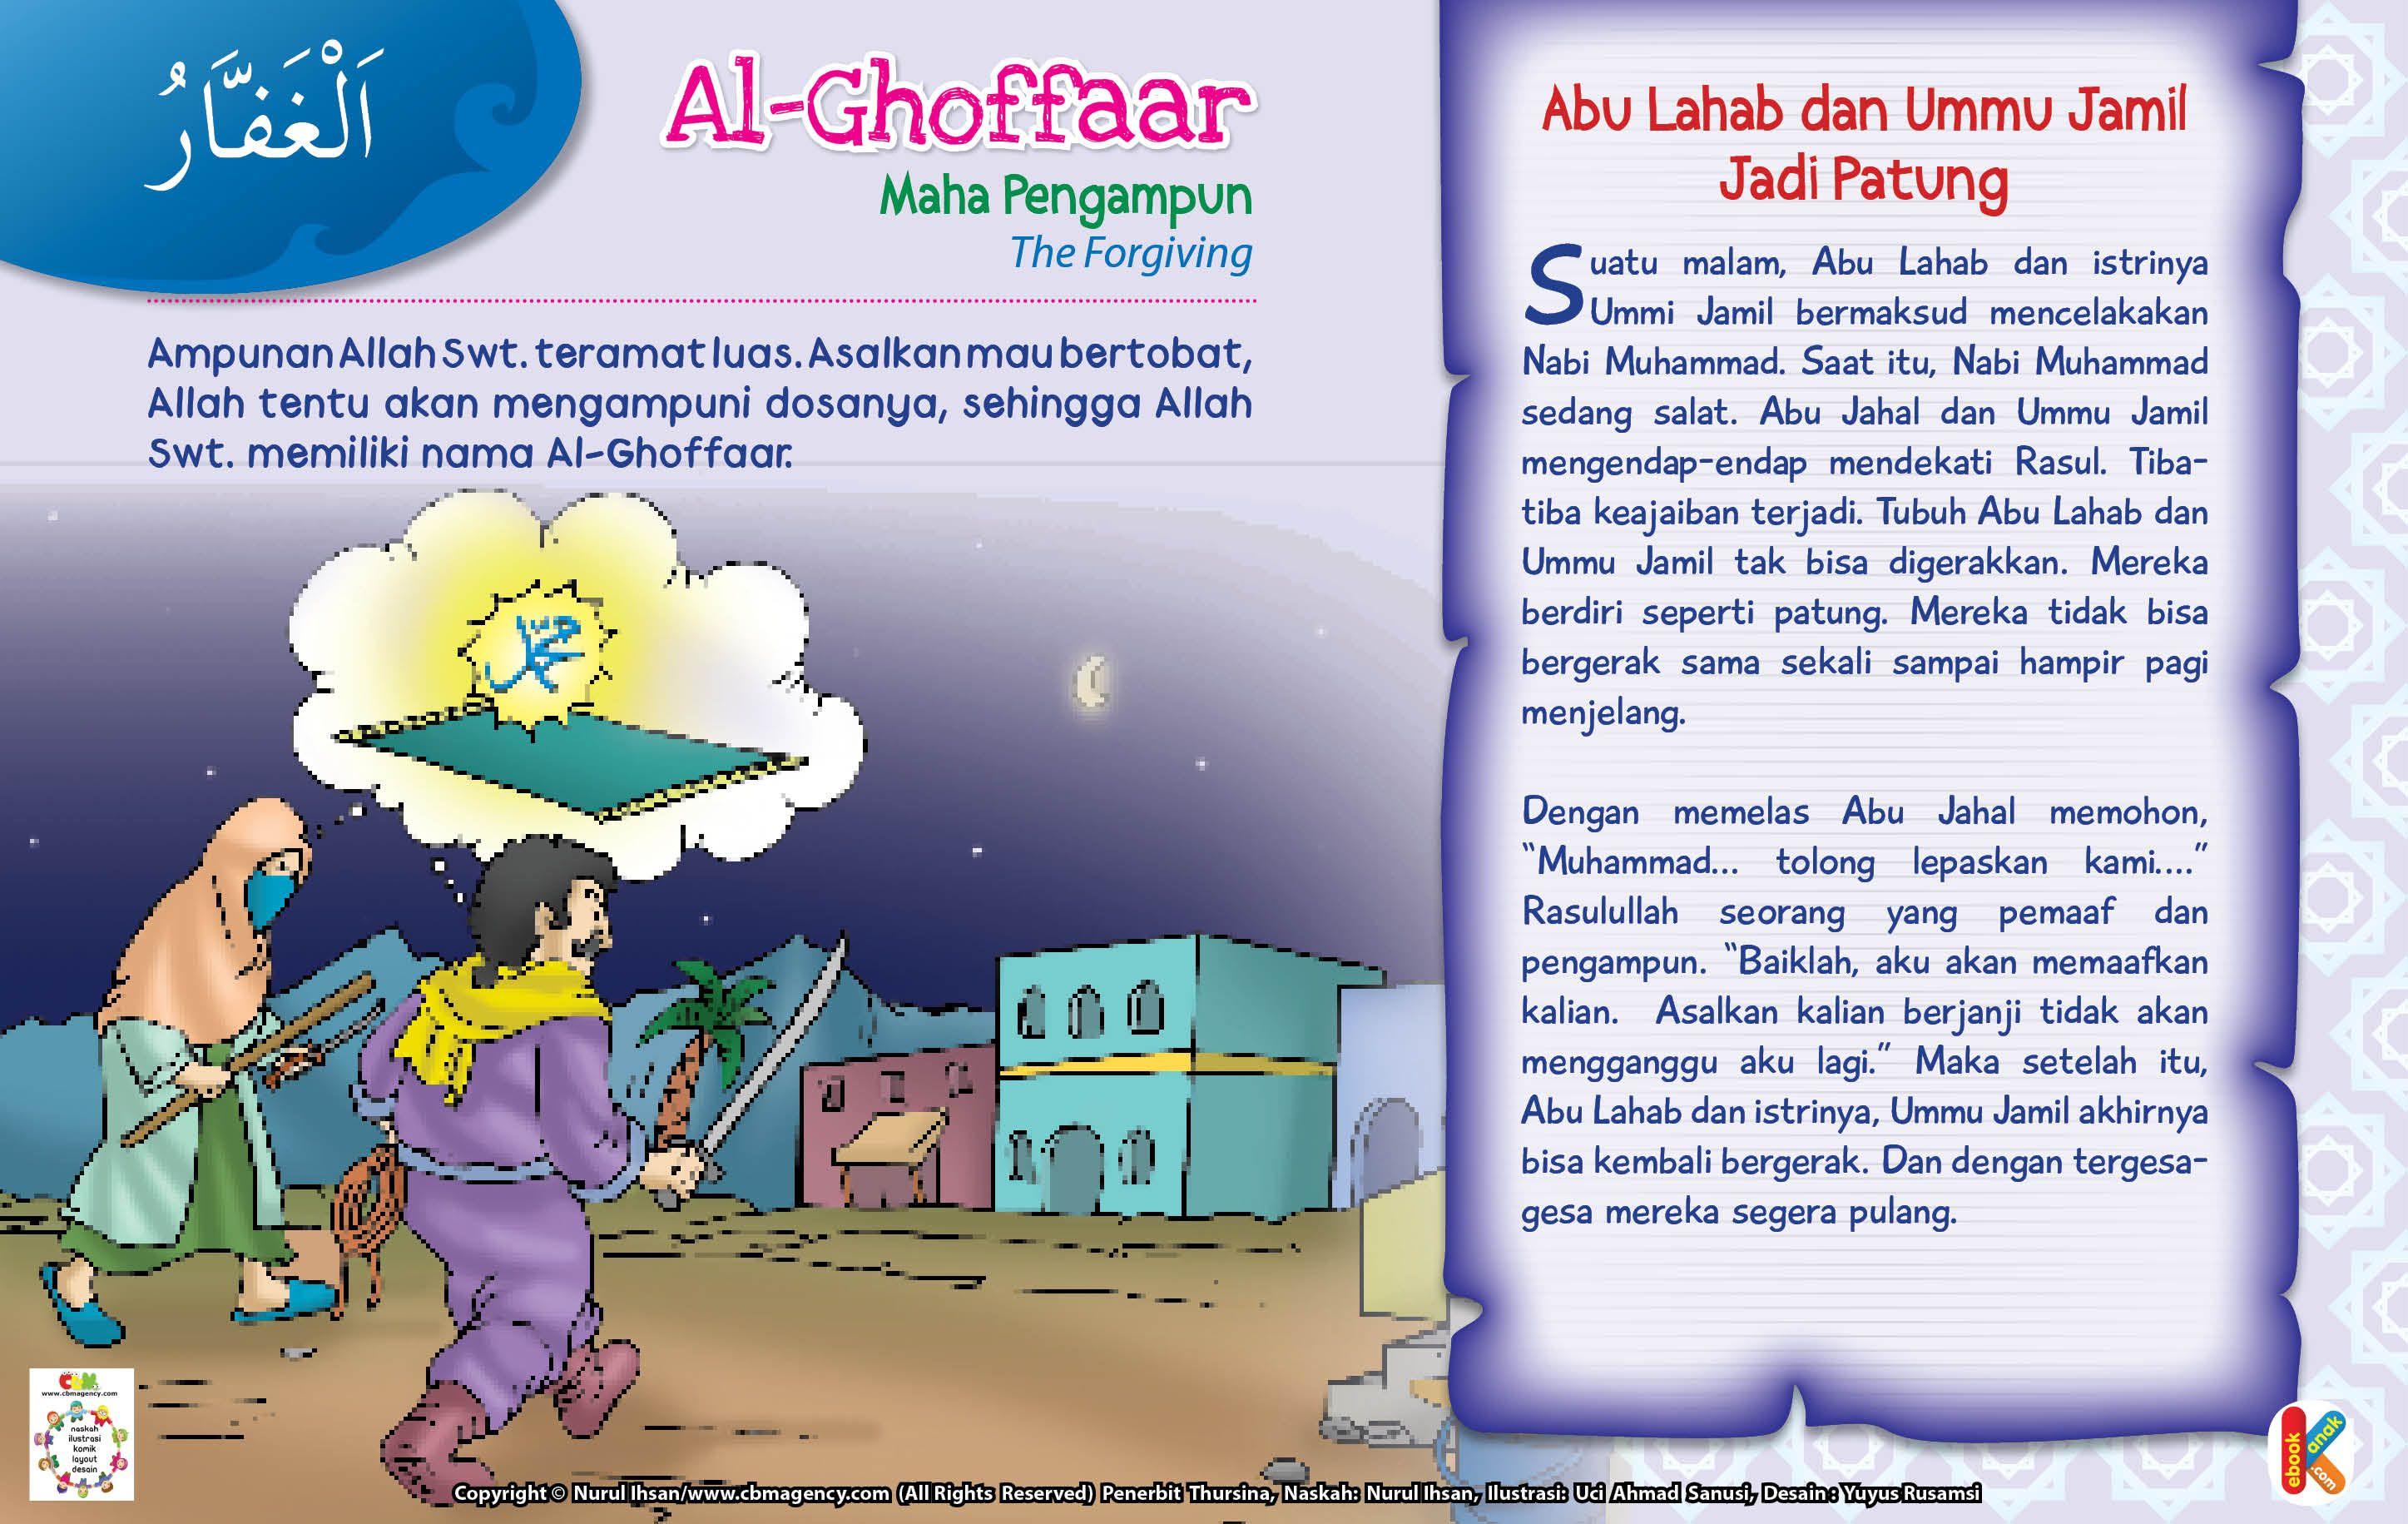 Kisah Asmaul Husna AlGhoffaar Anak, Sejarah, Islam